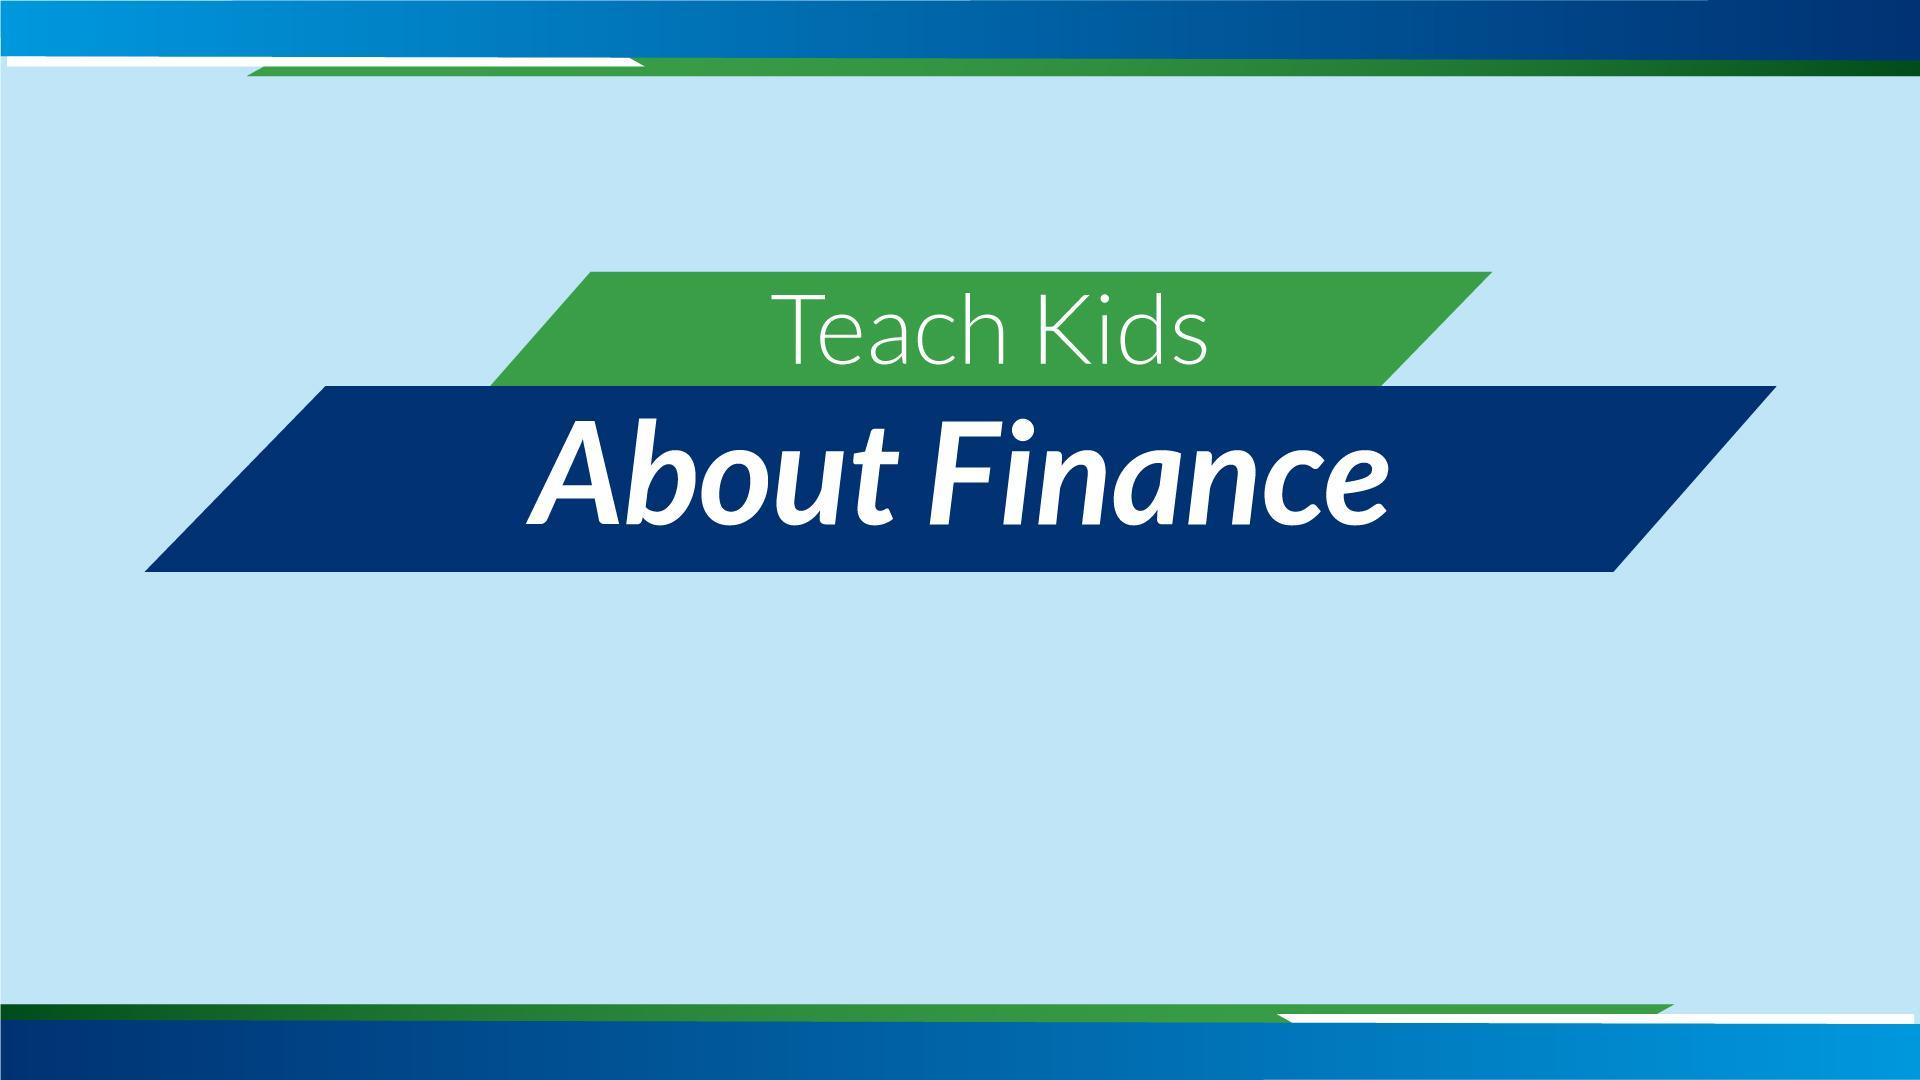 Teach Kids About Finance Thumbnail